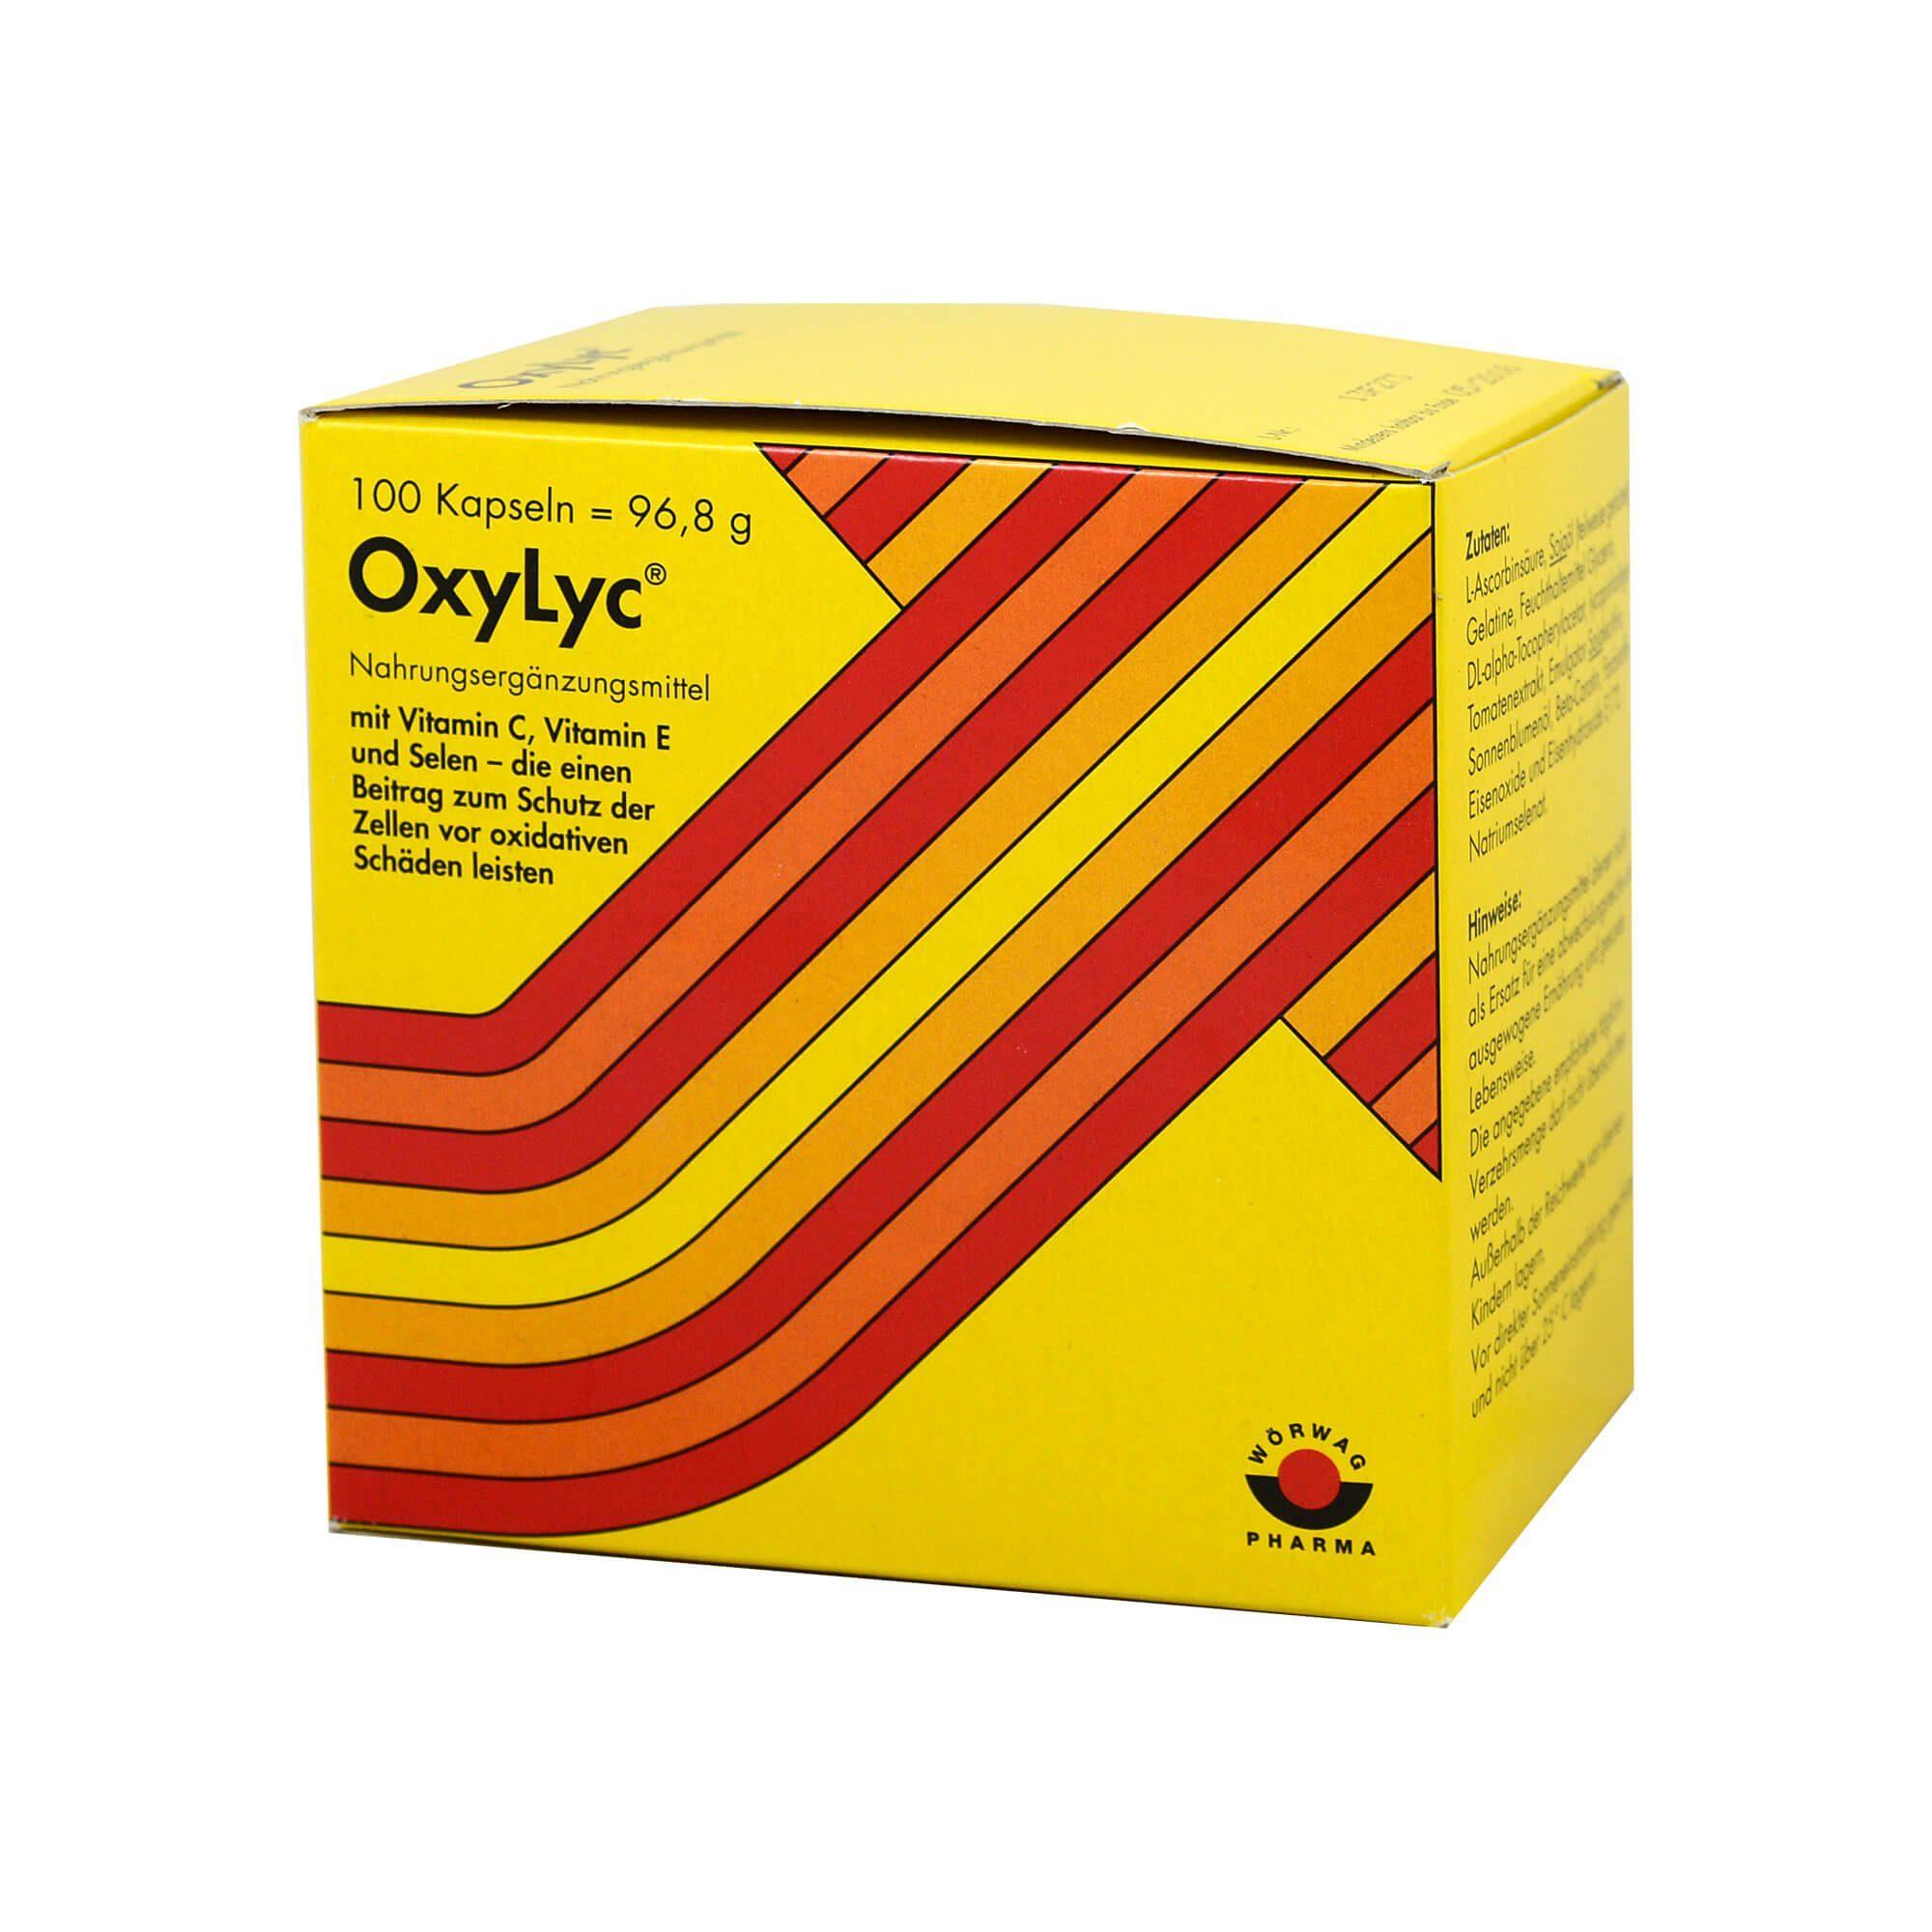 OxyLyc Kapseln , 100 St